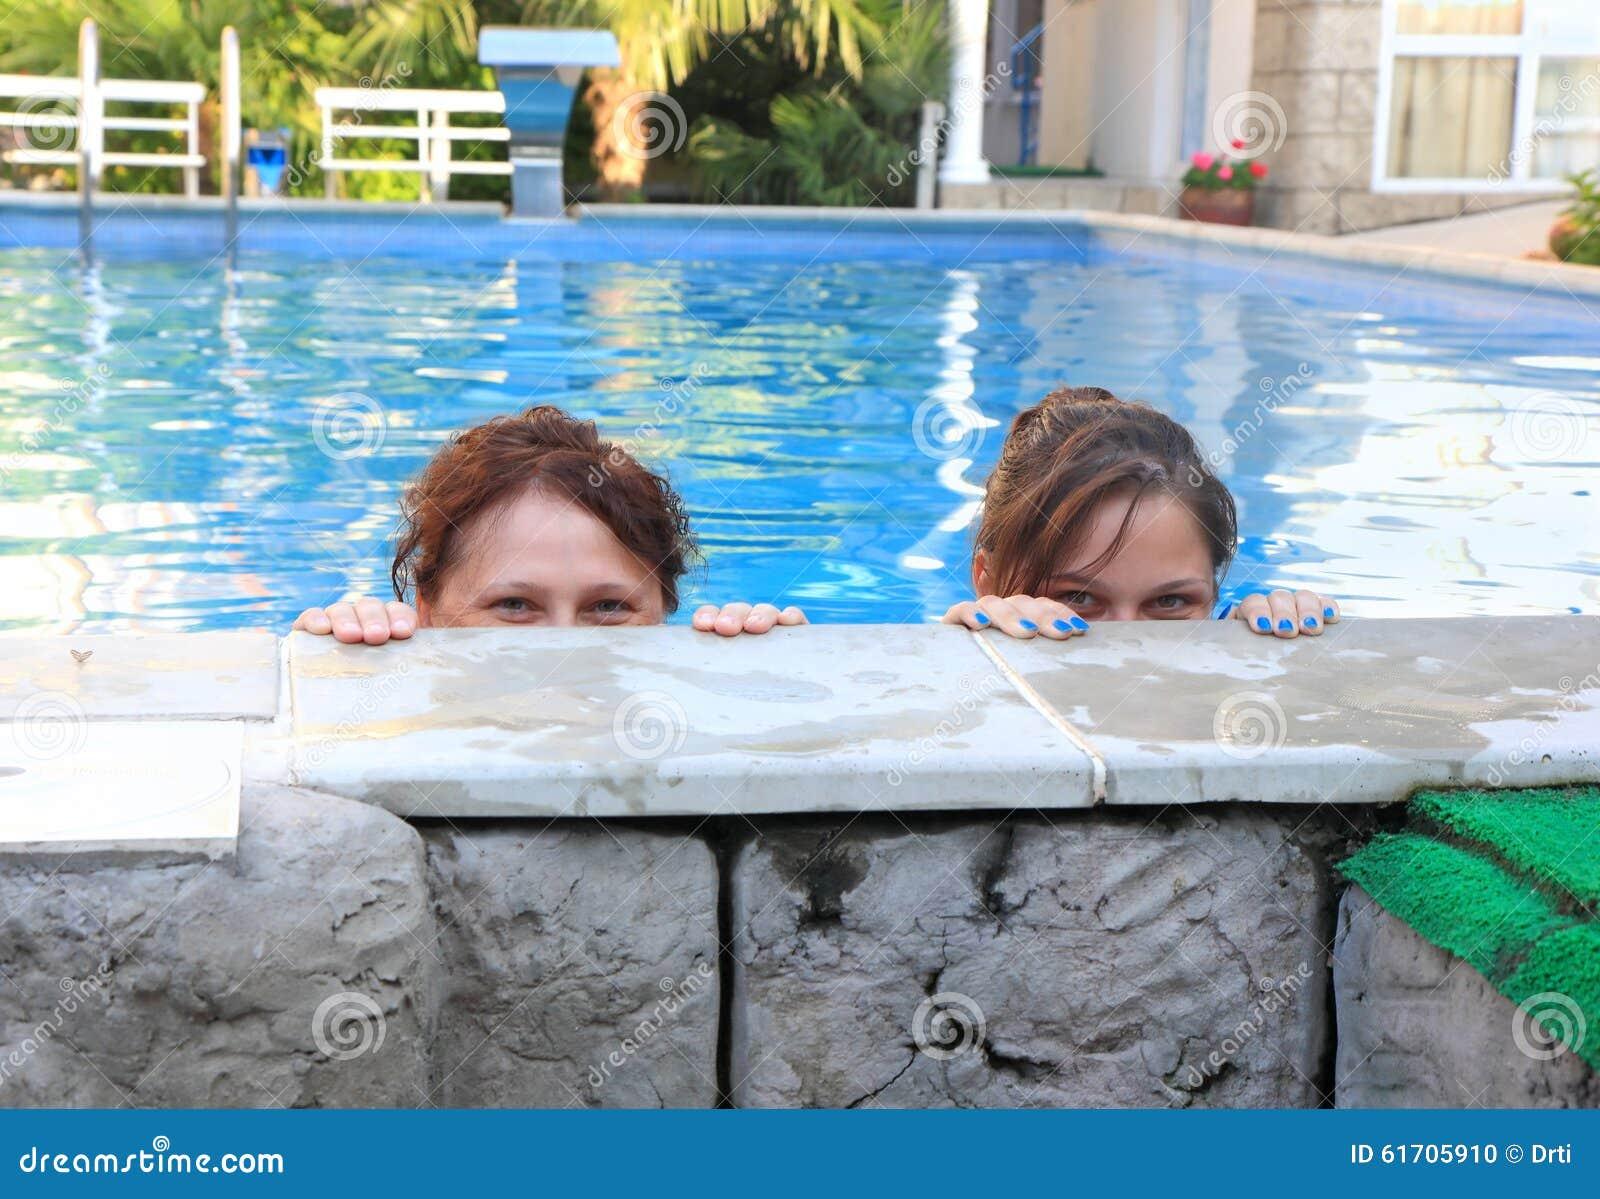 Piscina madre hija for Putas en la piscina